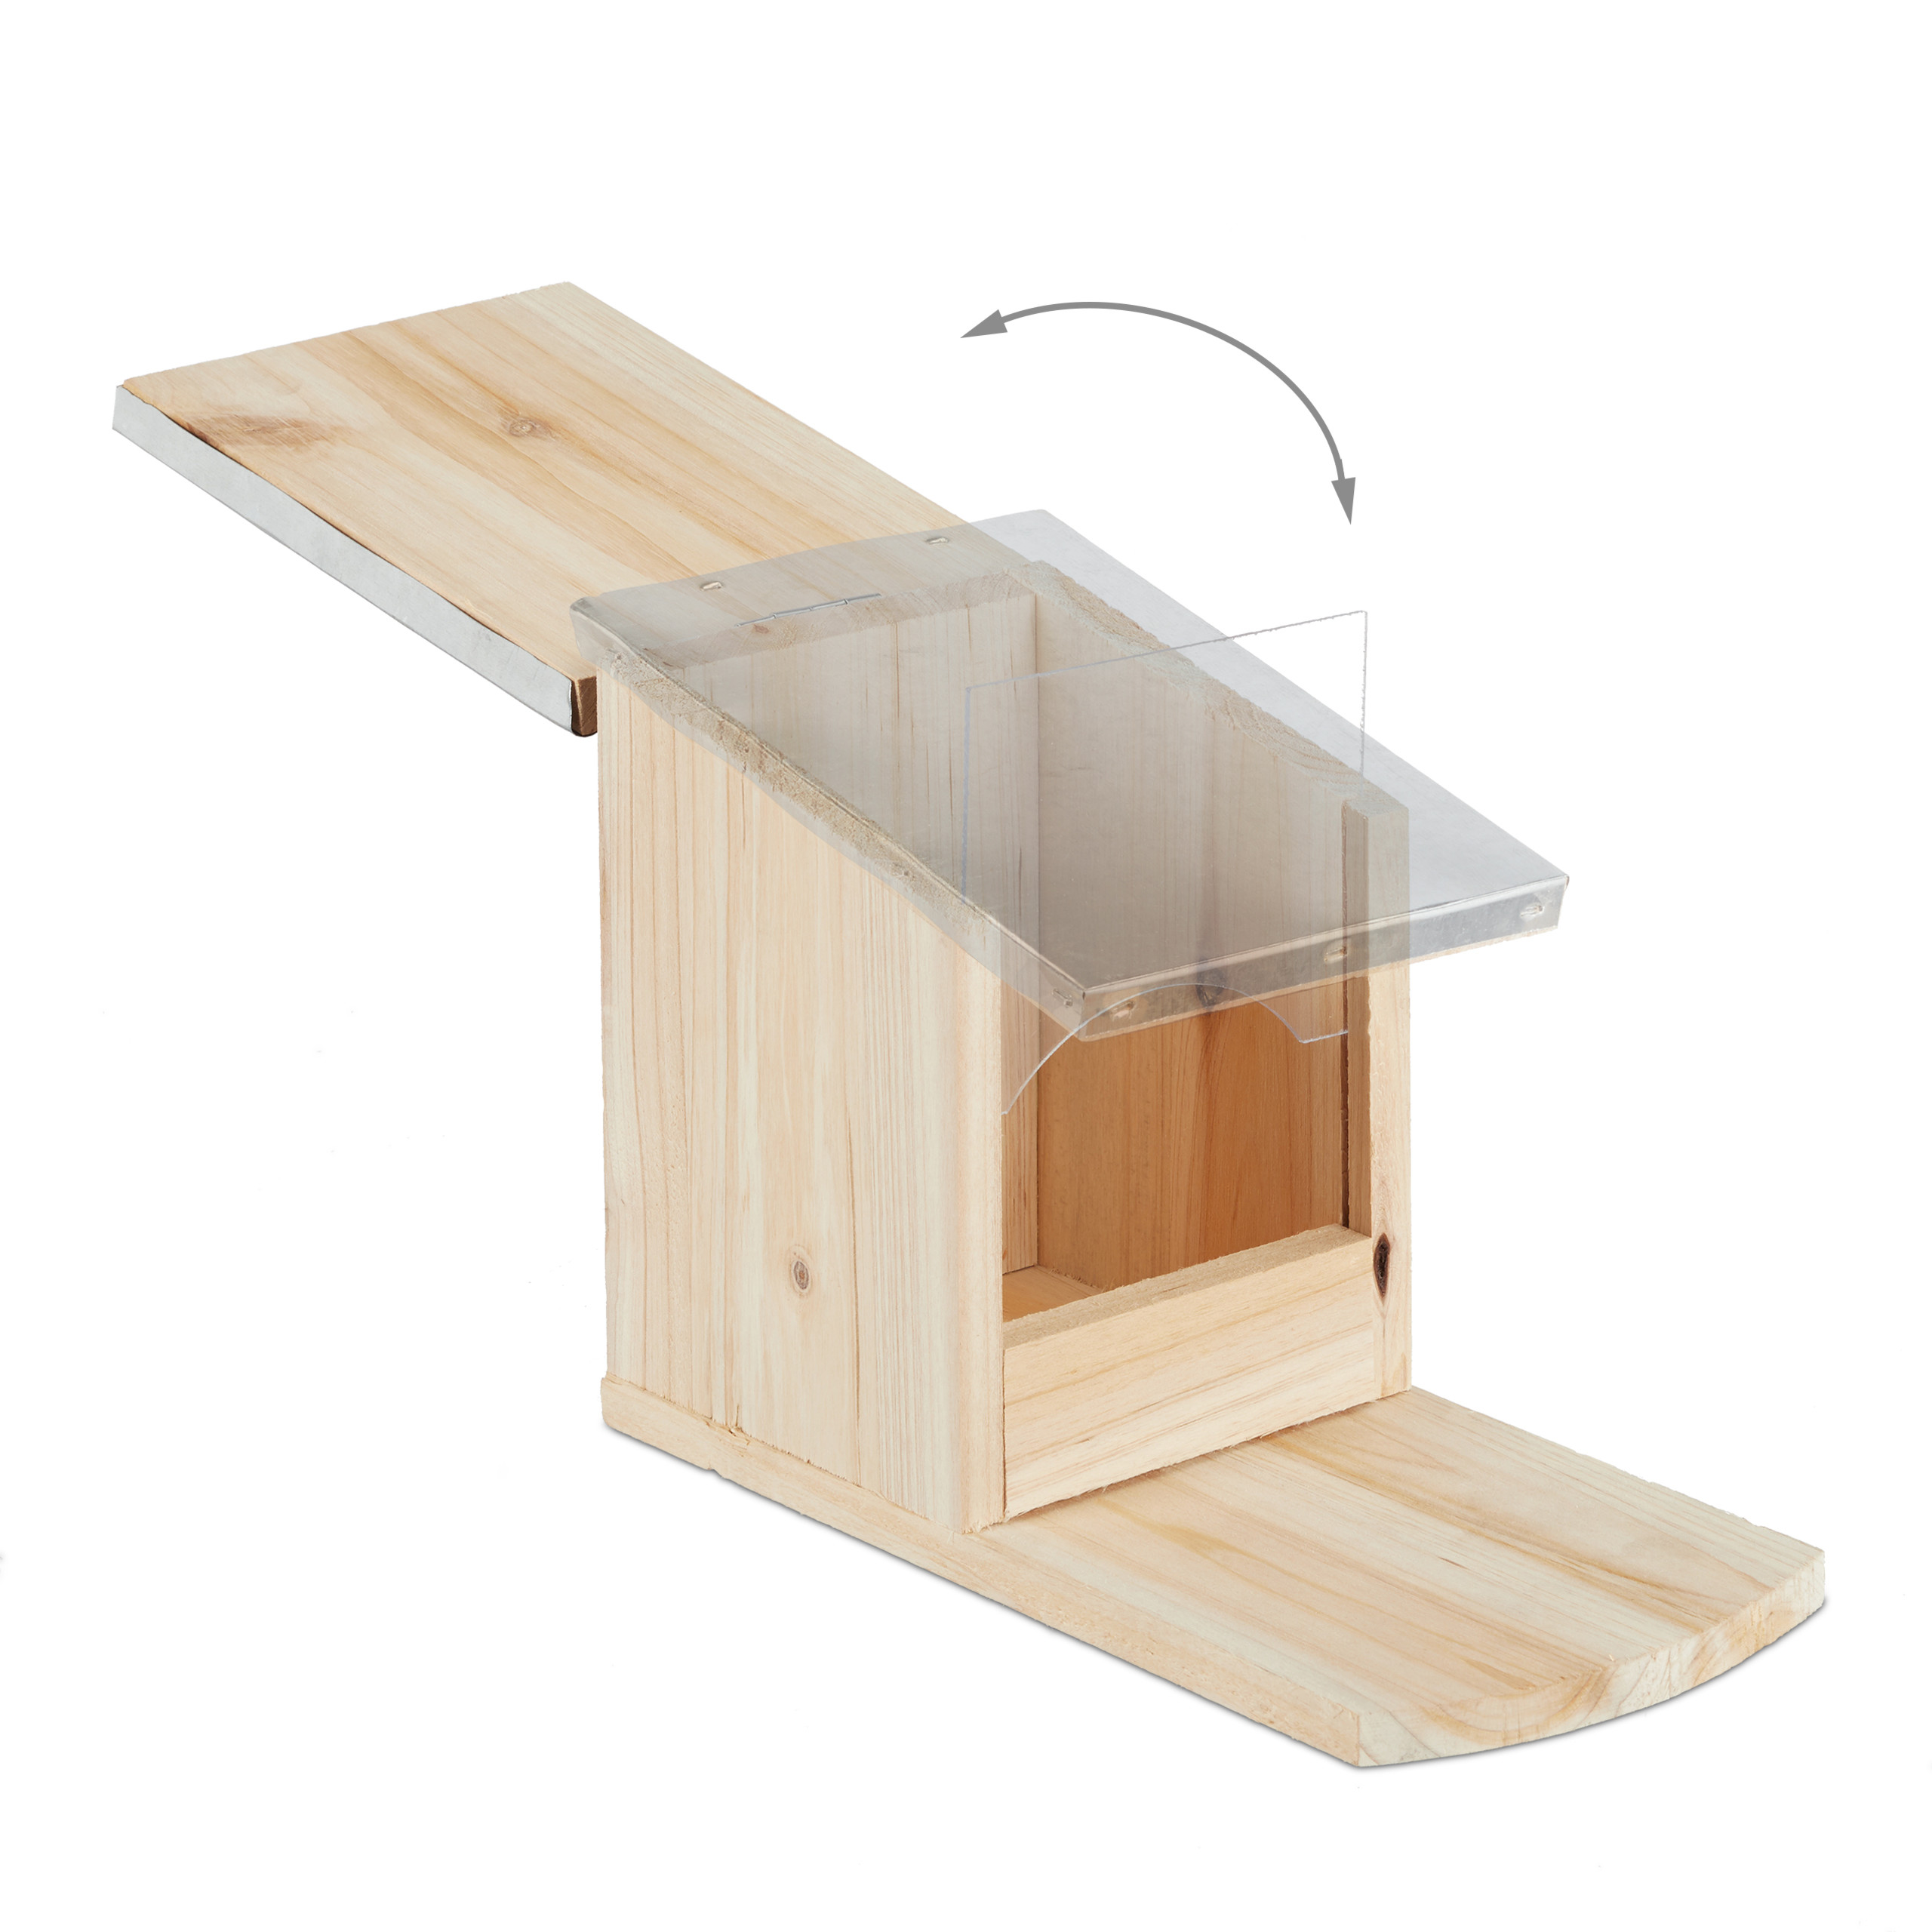 eekhoorn-voederhuisje-metalen-dak-hout-voederhuis-voederkast miniatuur 7